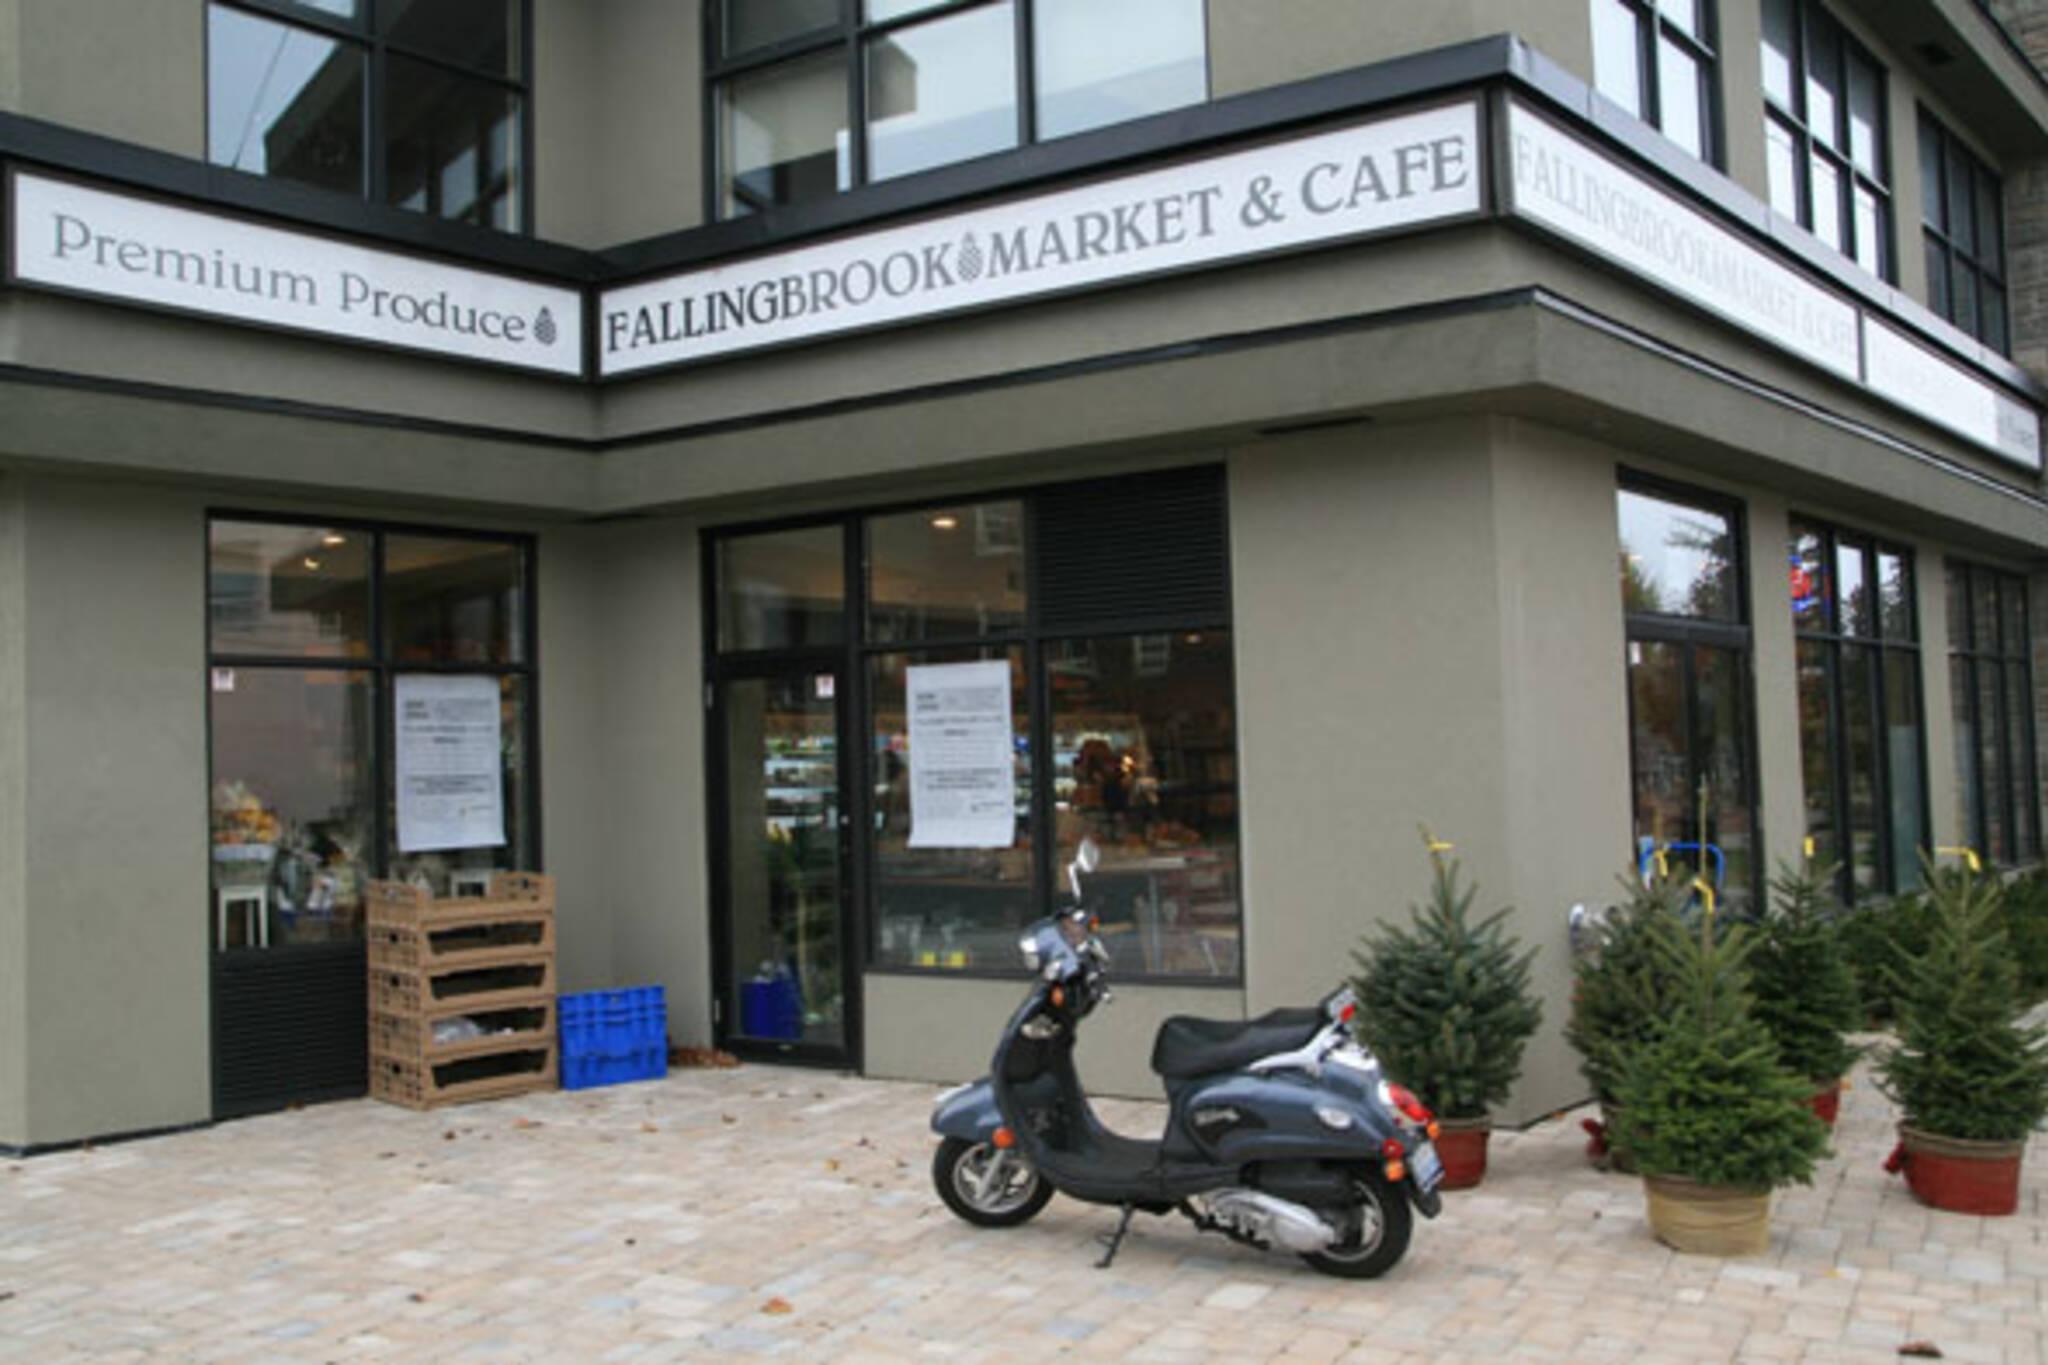 Fallingbrook Market